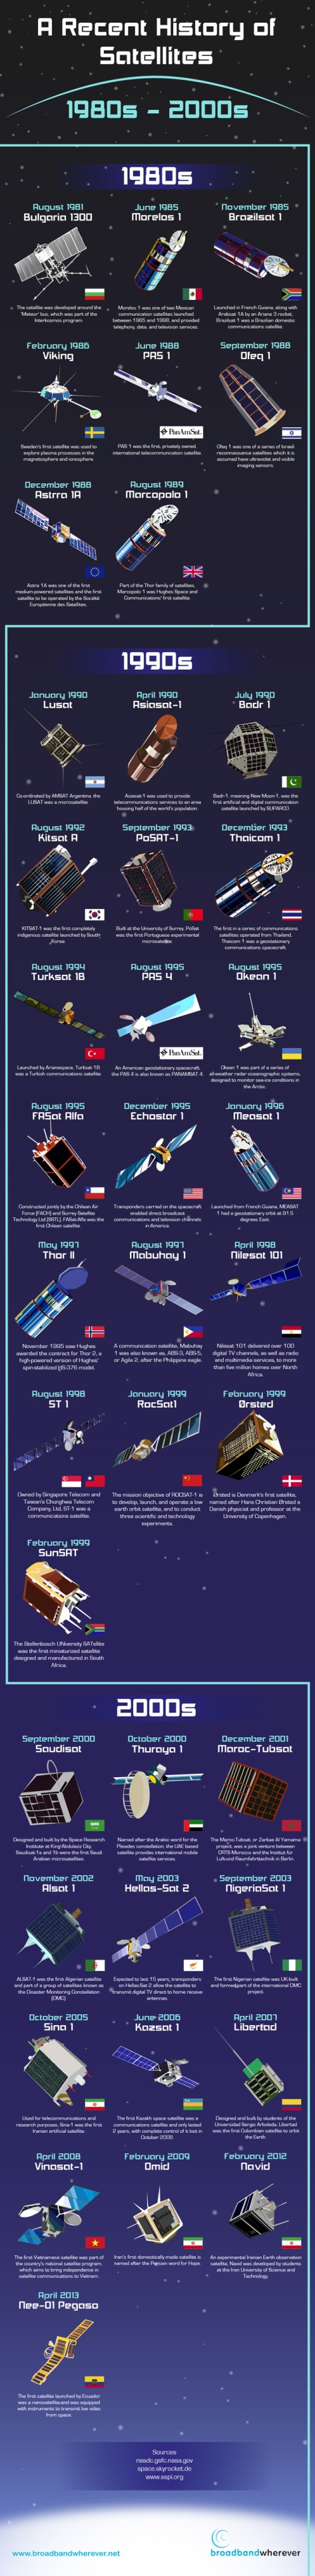 Satellite history